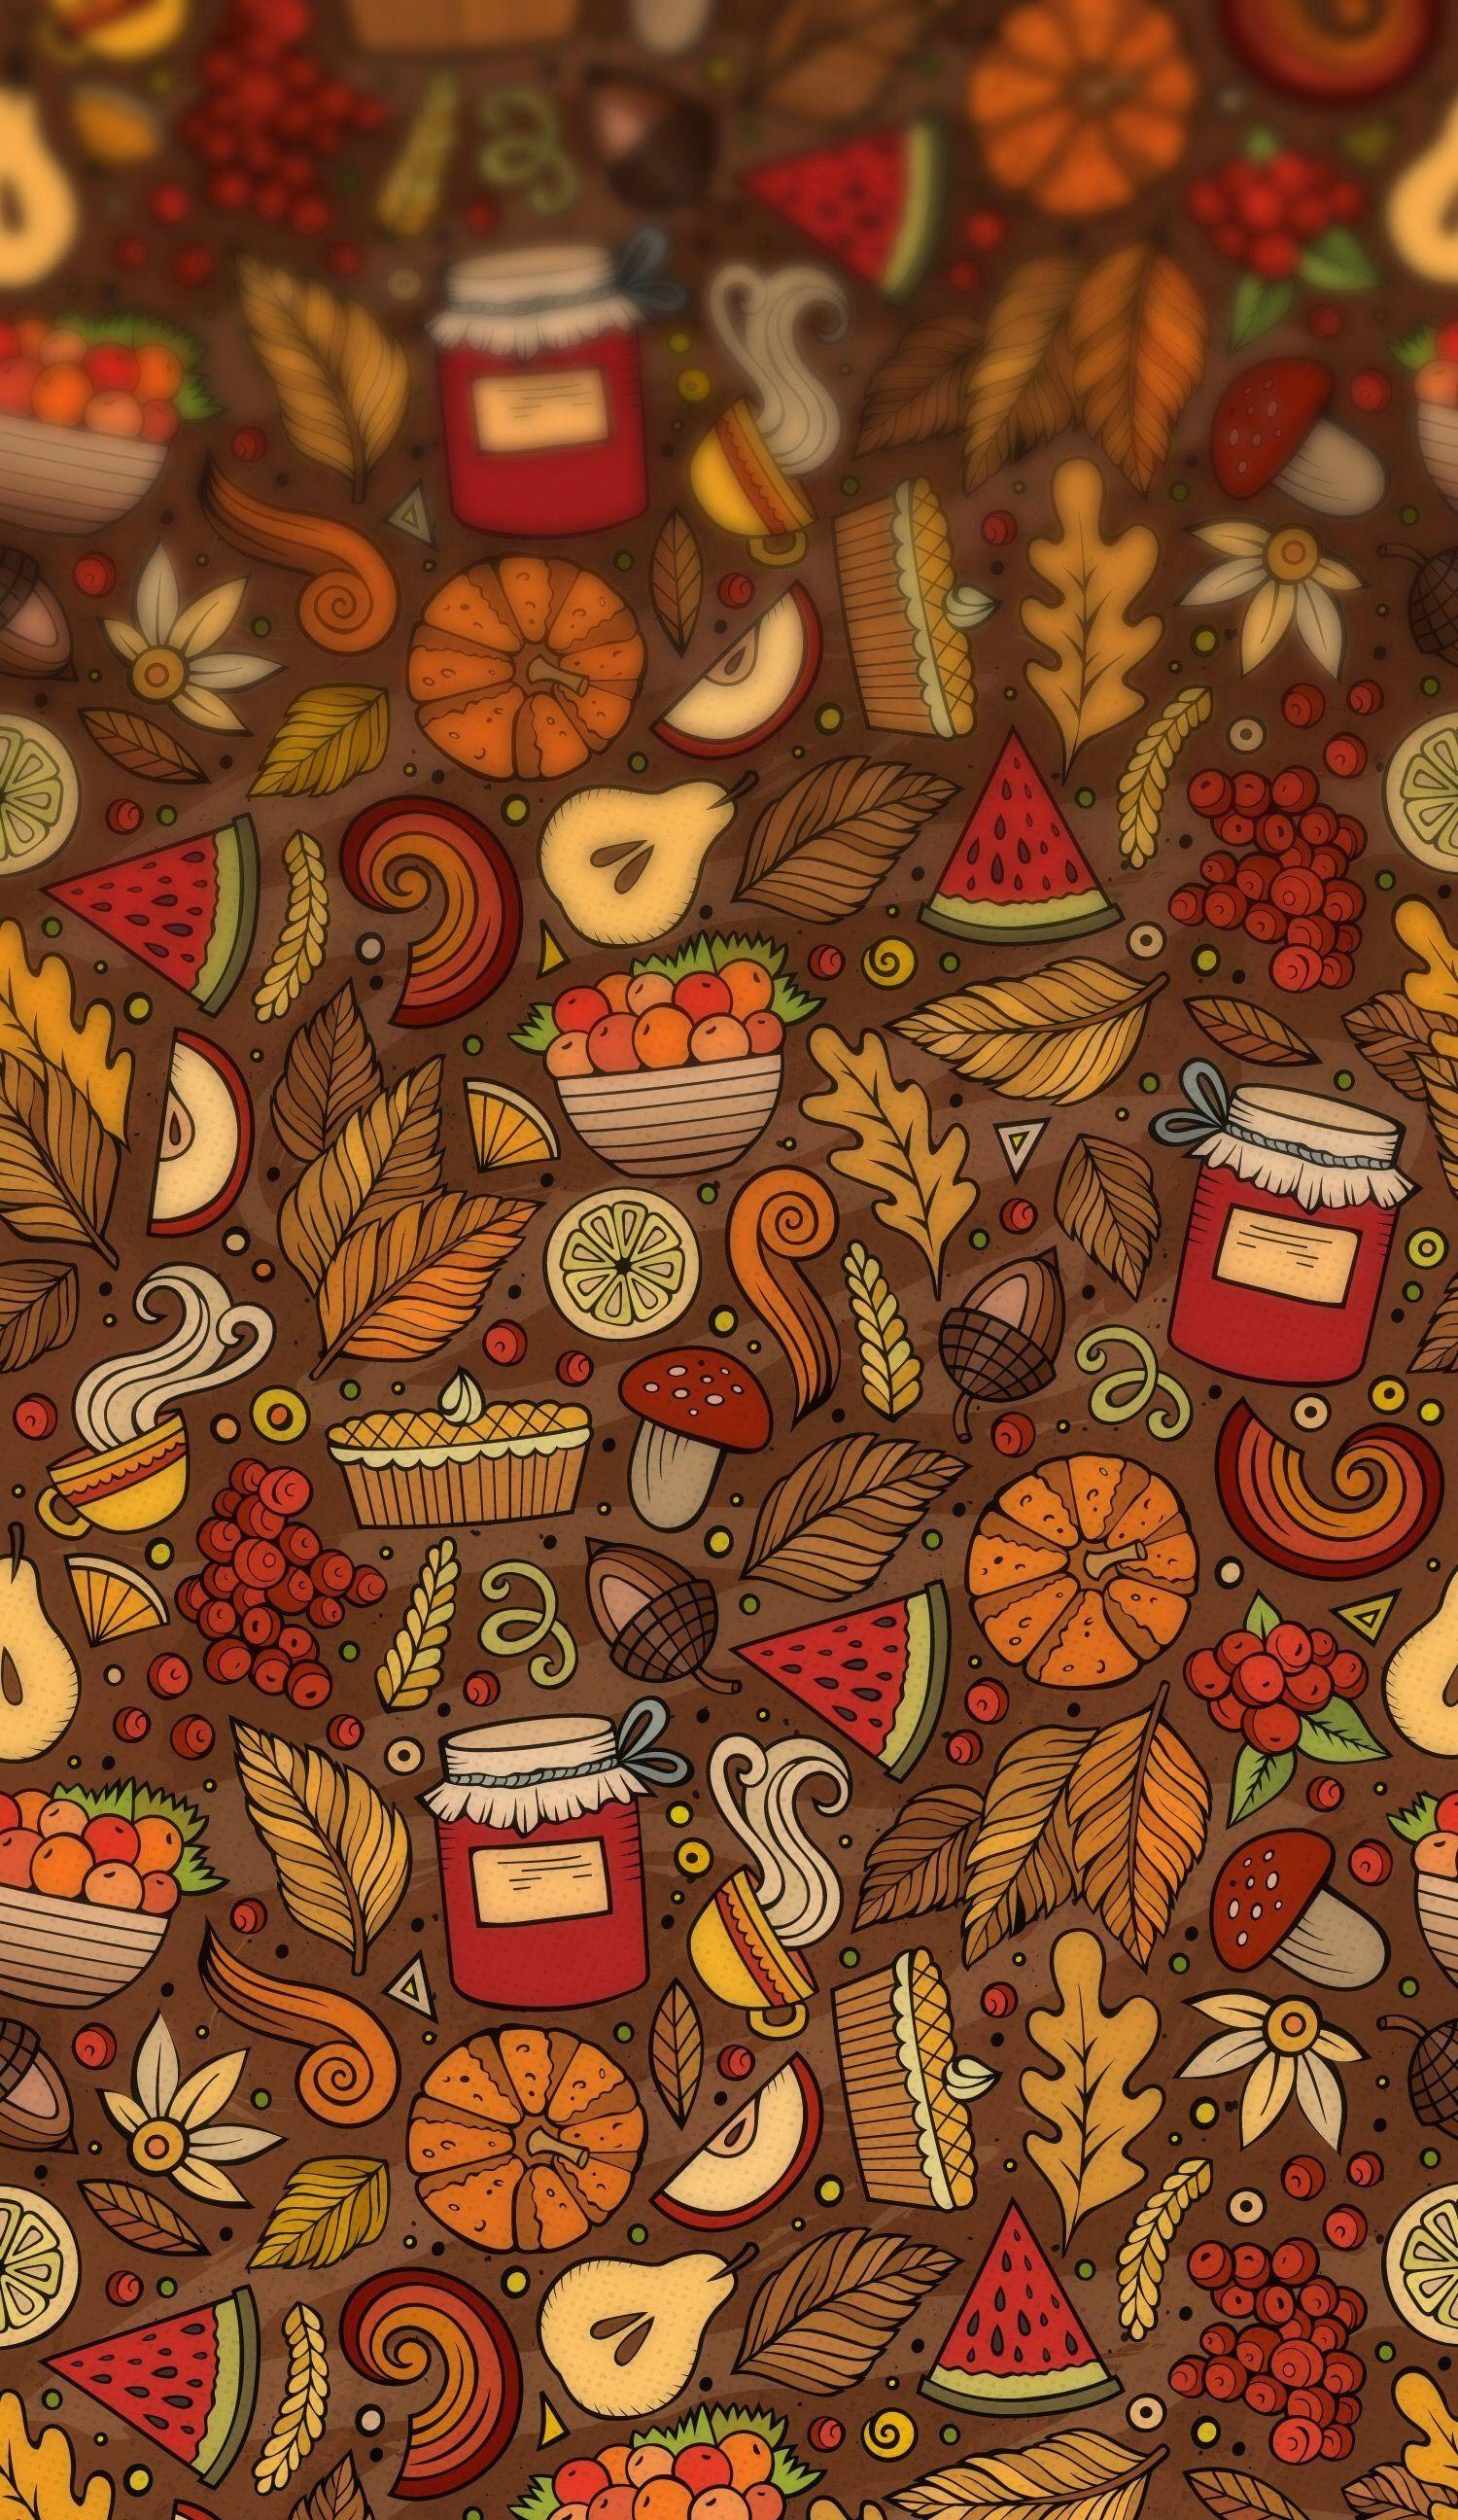 Thanksgiving 1000 in 2020 Fall wallpaper, Plain